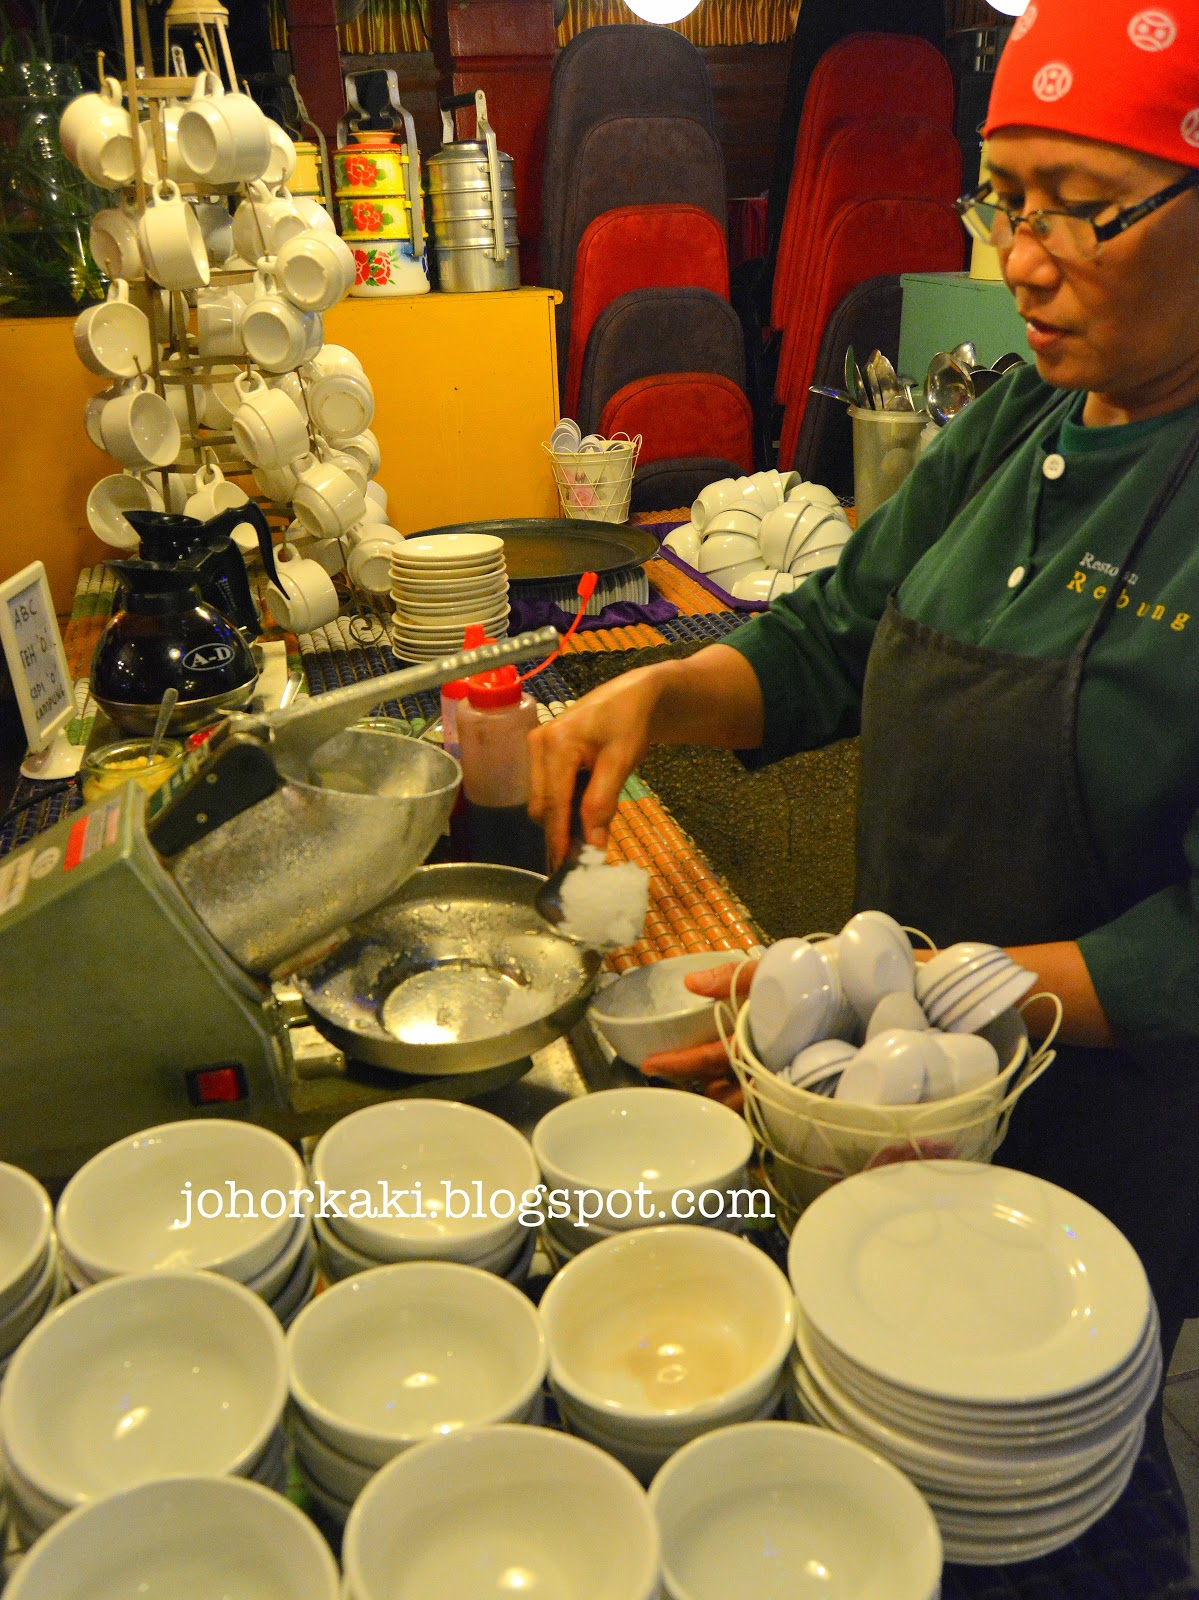 Restoran Rebung By Dato Chef Ismail In Bangsar Kuala Lumpur Malaysia Jk1139 Johor Kaki Travels For Food